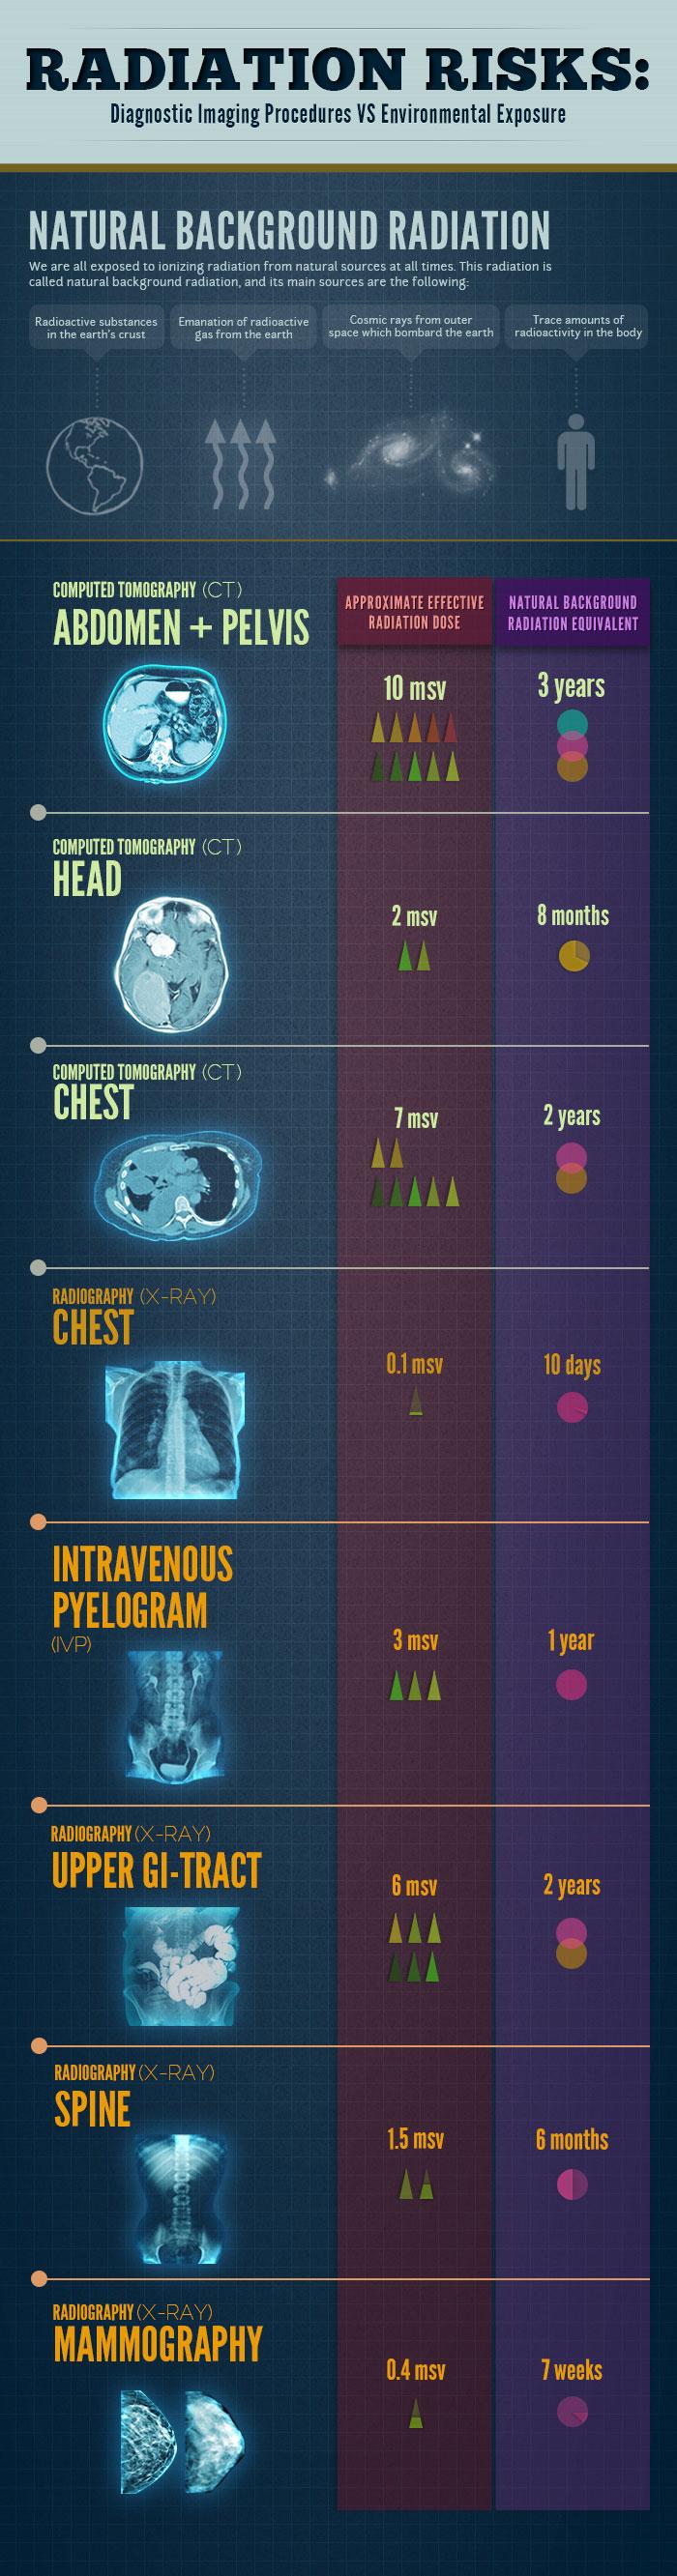 radiation-risks-diagnostic-imaging-procedures-vs-environmental-exposure_50c6d1eb60958